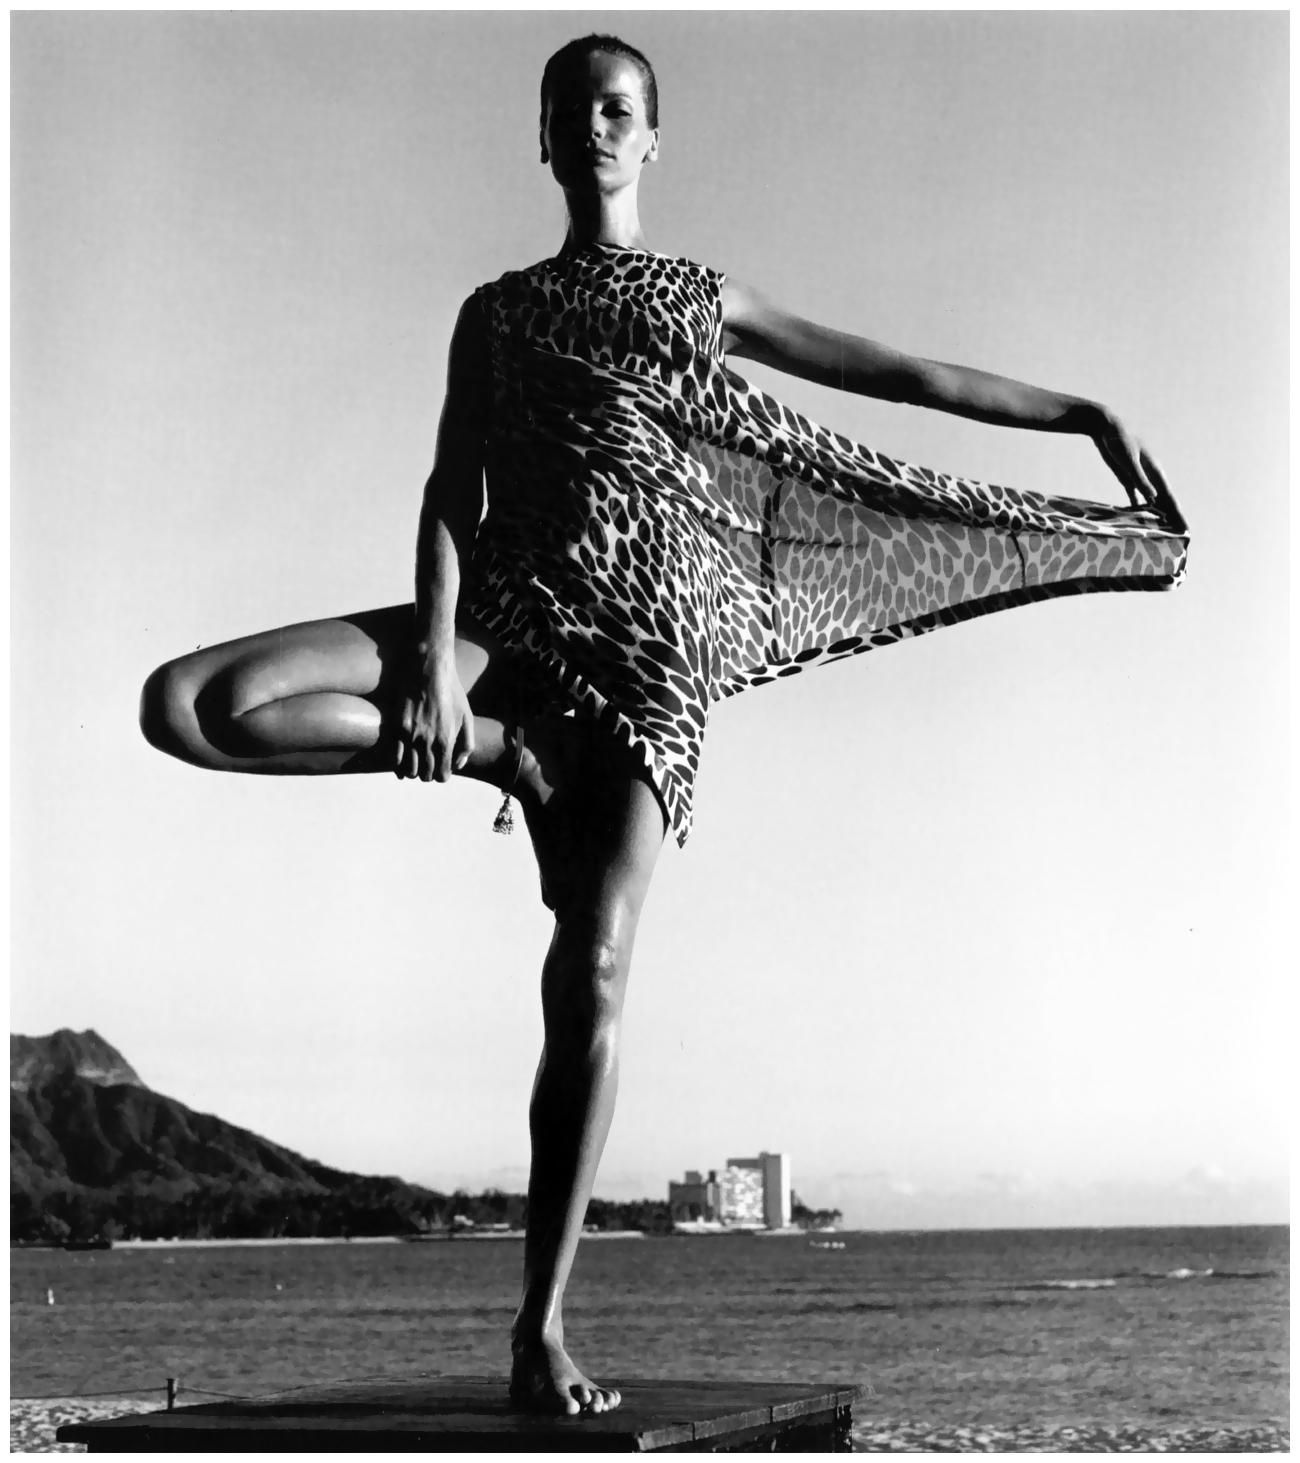 horst-p-horst-1965-veruschka-von-lehndorf-in-hawaii